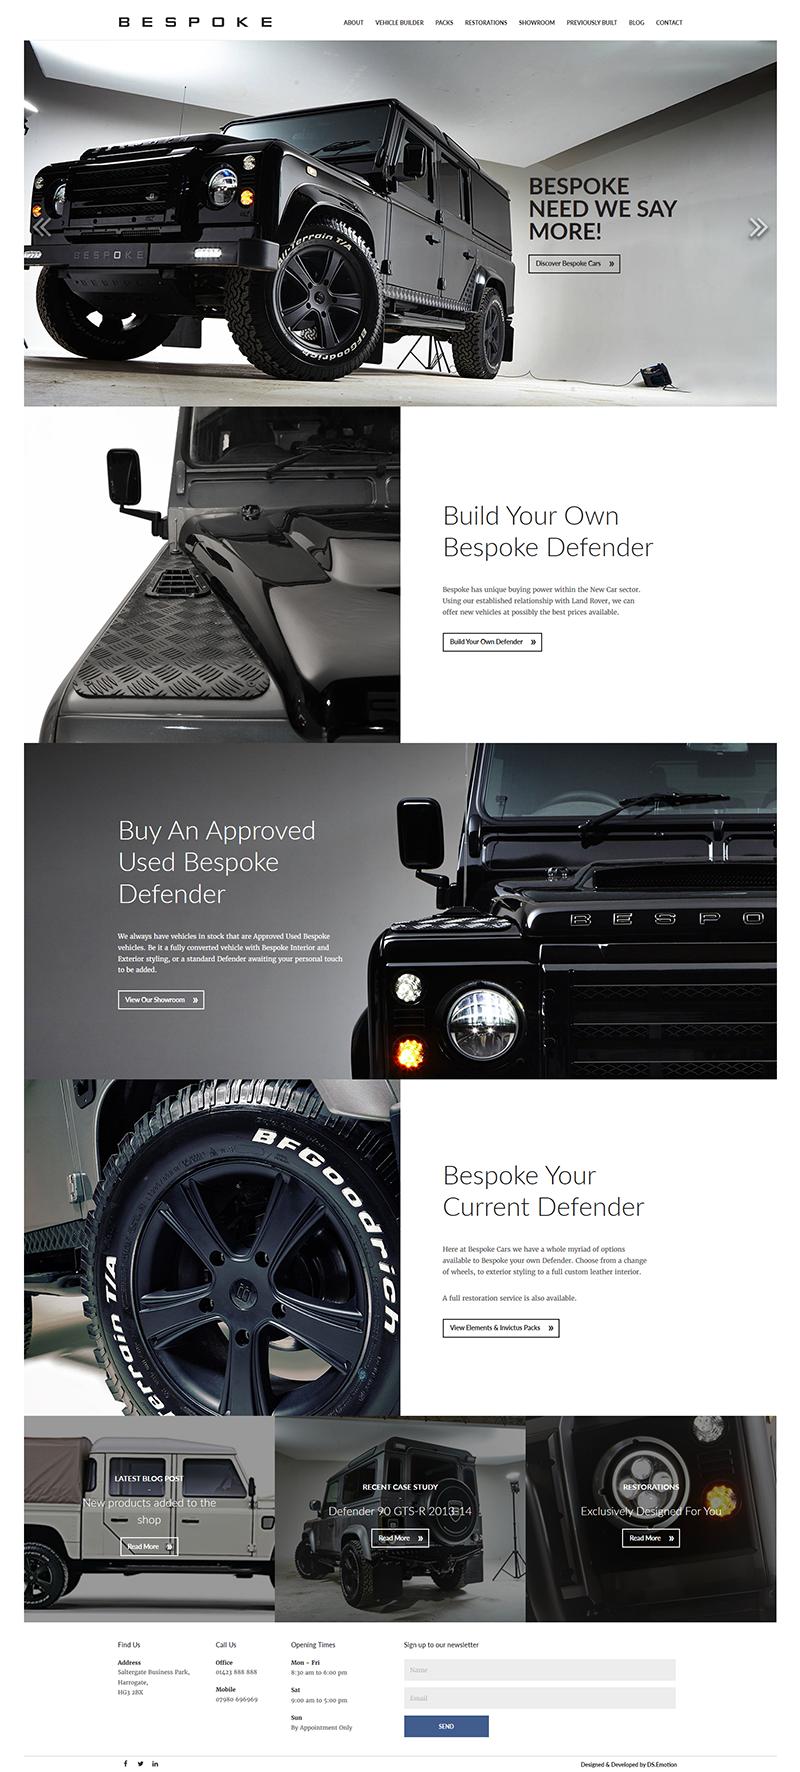 Bespoke Cars - Wordpress site